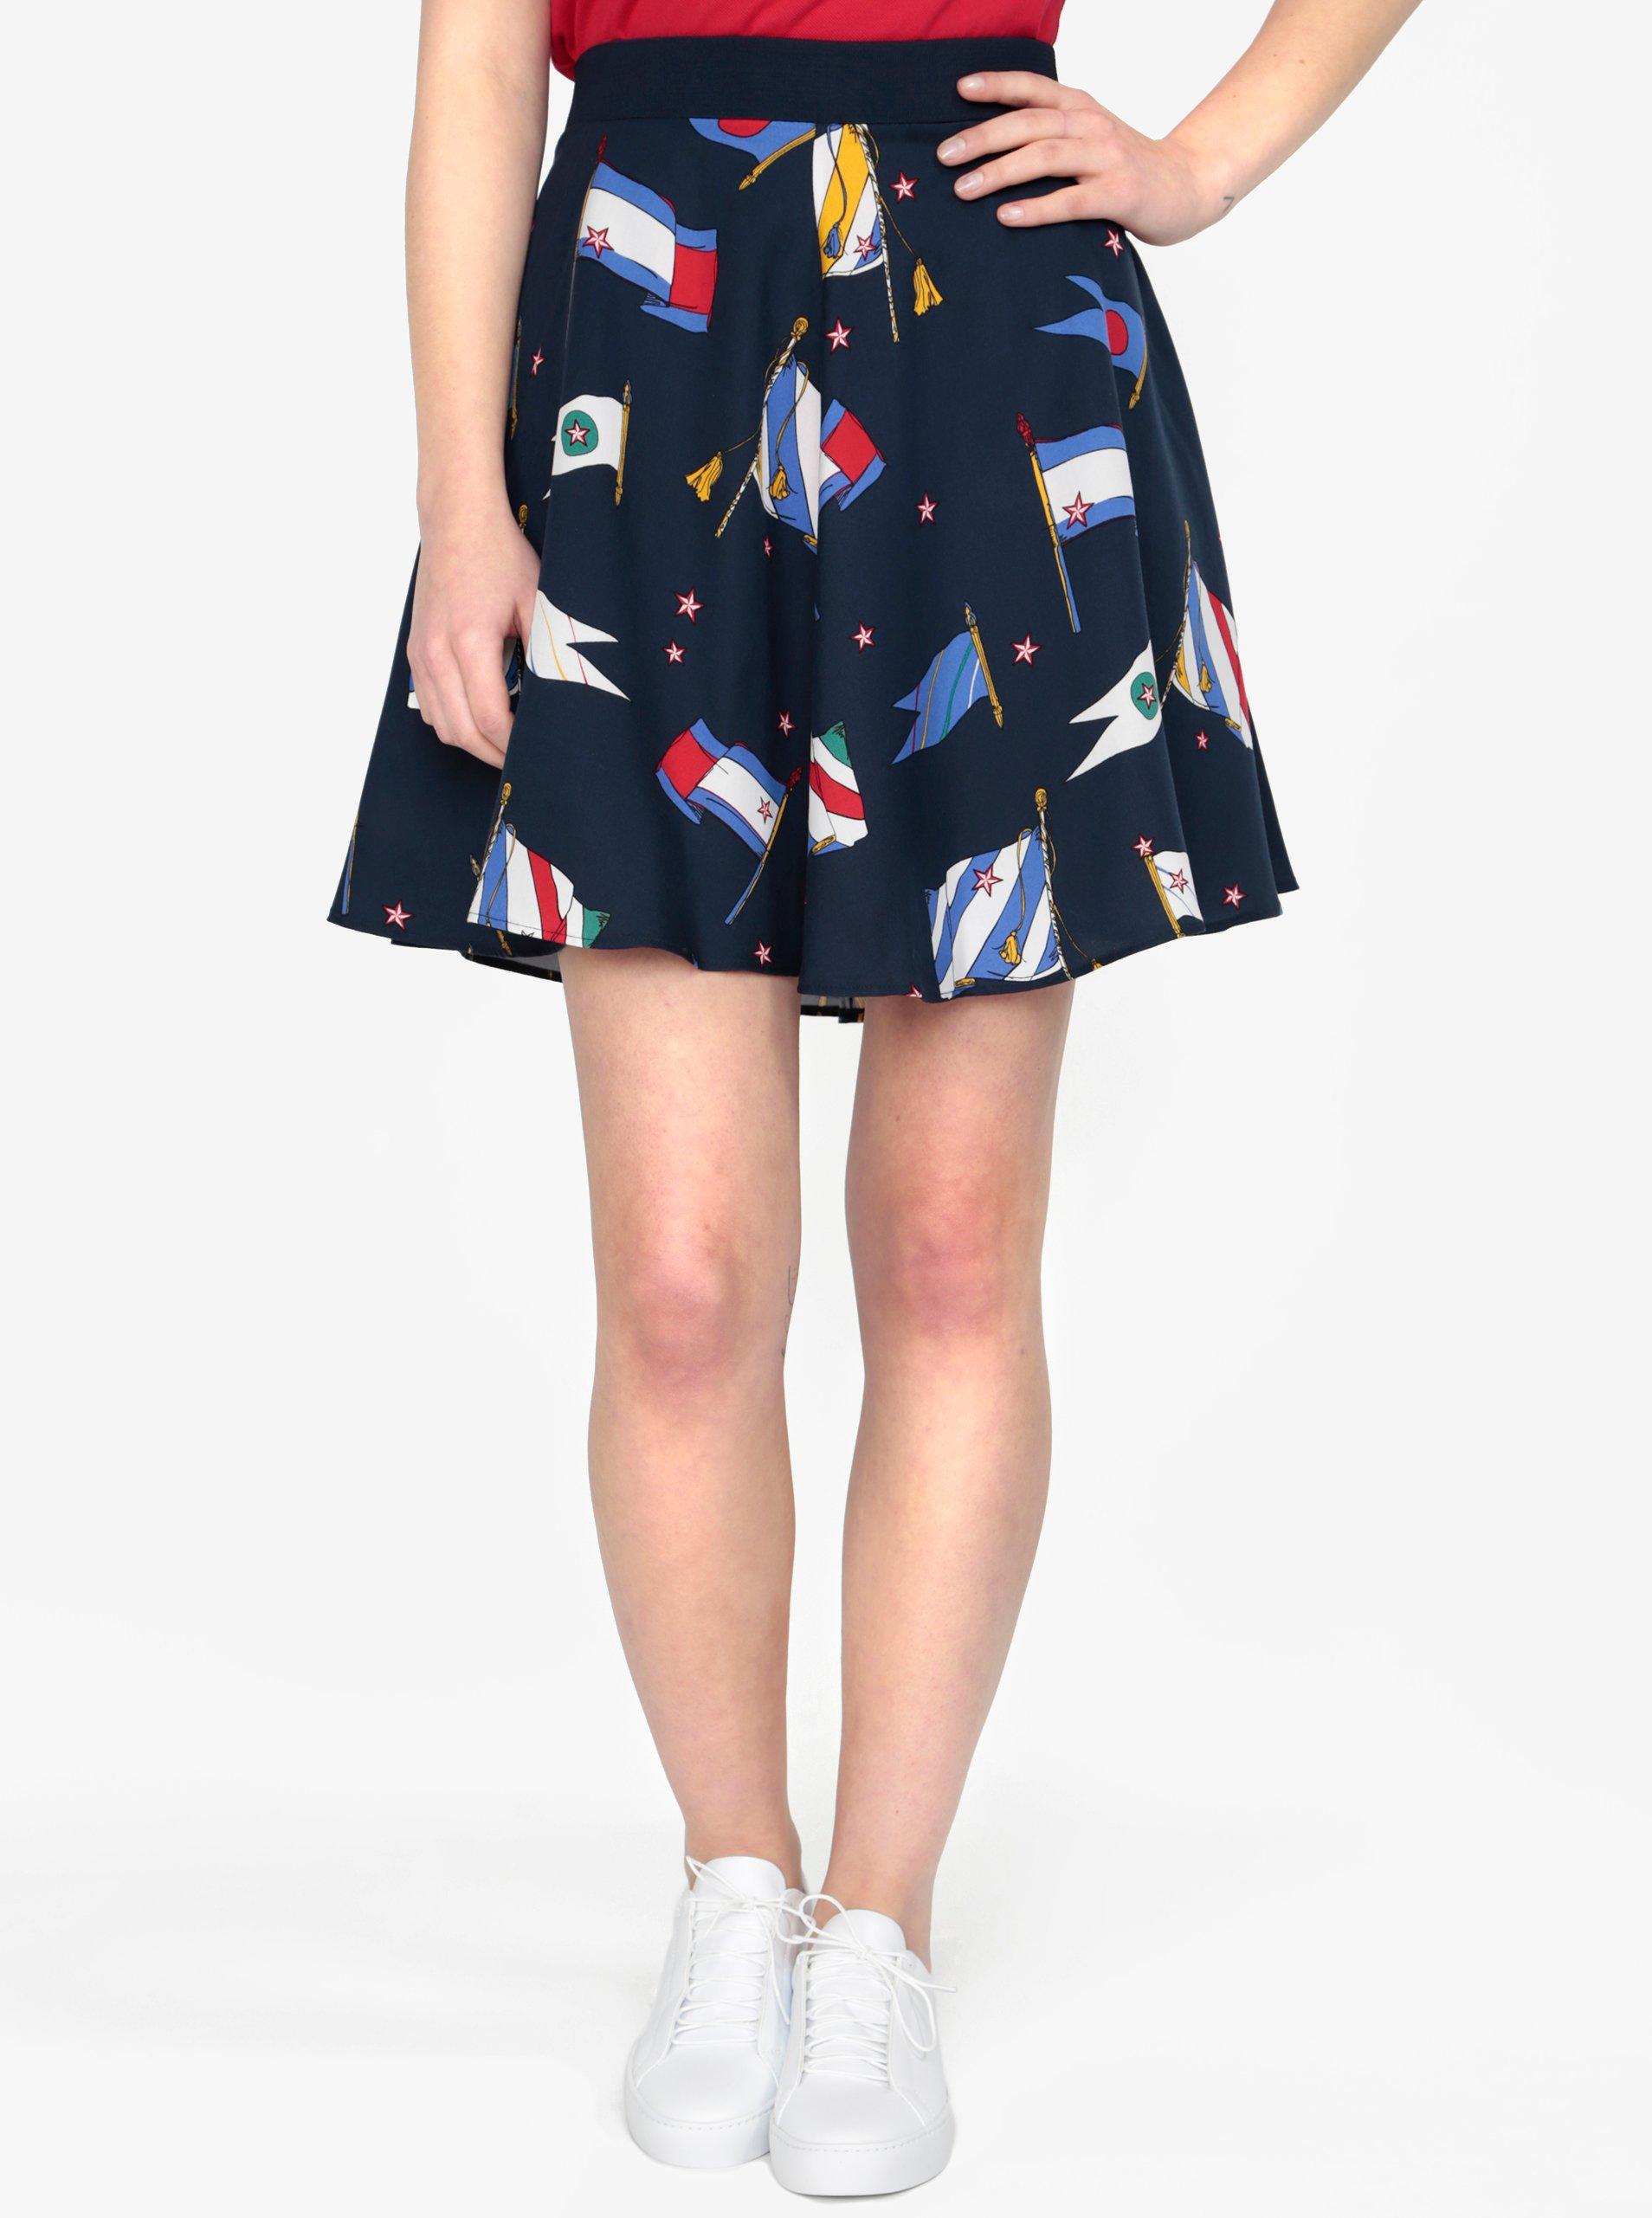 5b841574ee Tmavomodrá vzorovaná sukňa Tommy Hilfiger